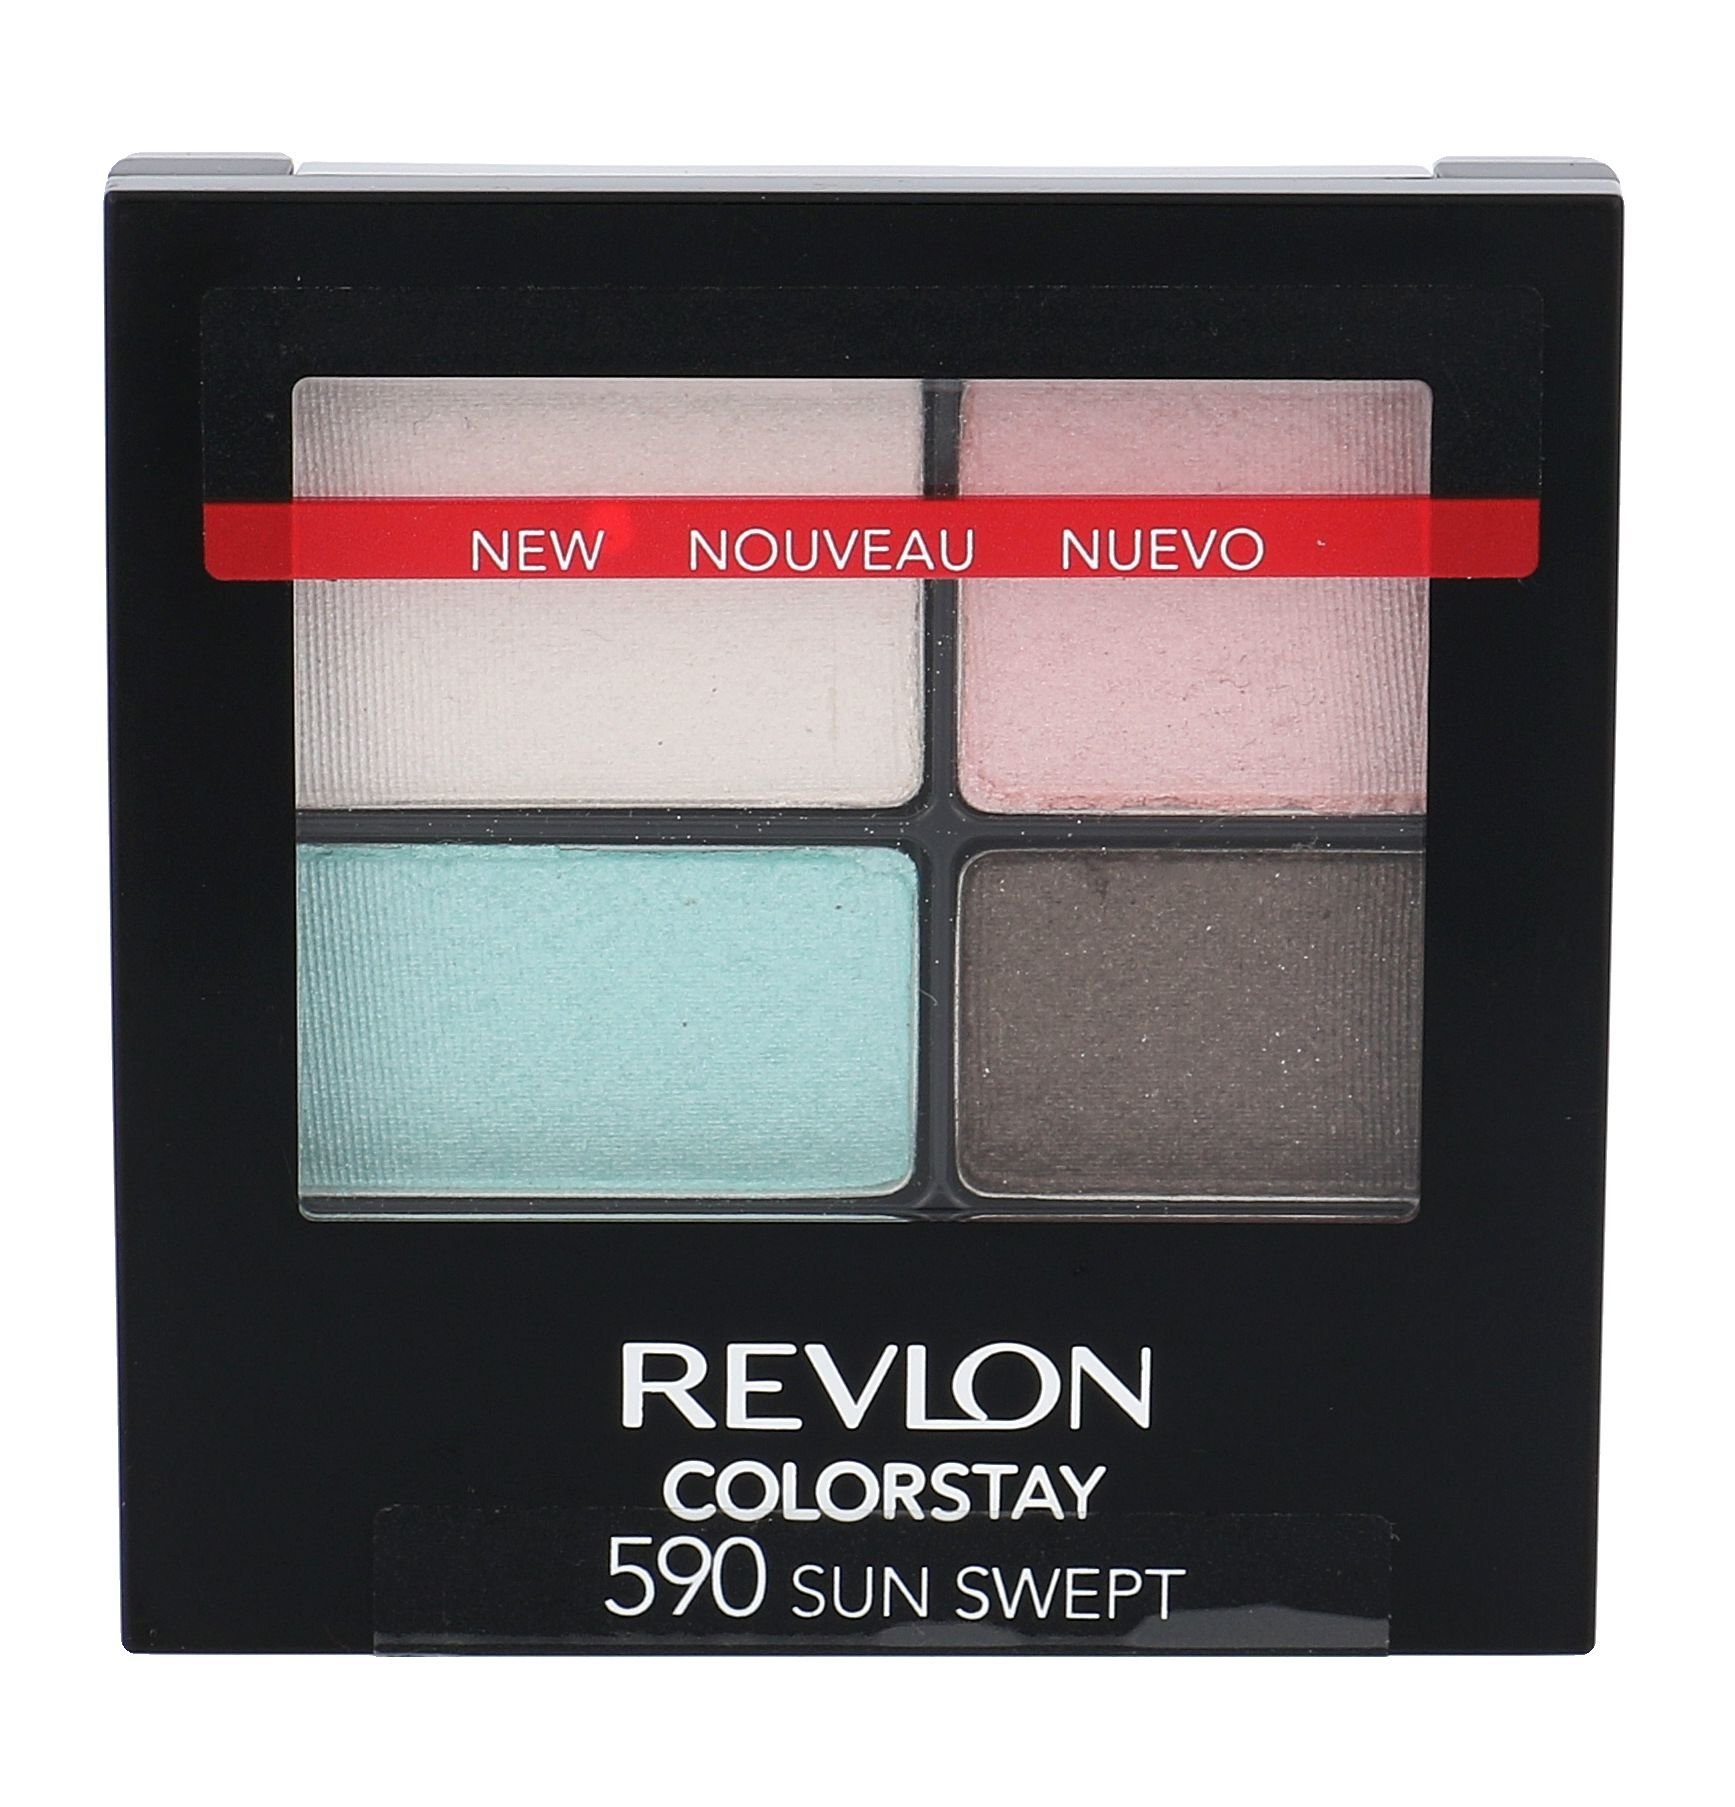 Revlon Colorstay Cosmetic 4,8ml 590 Sun Swept